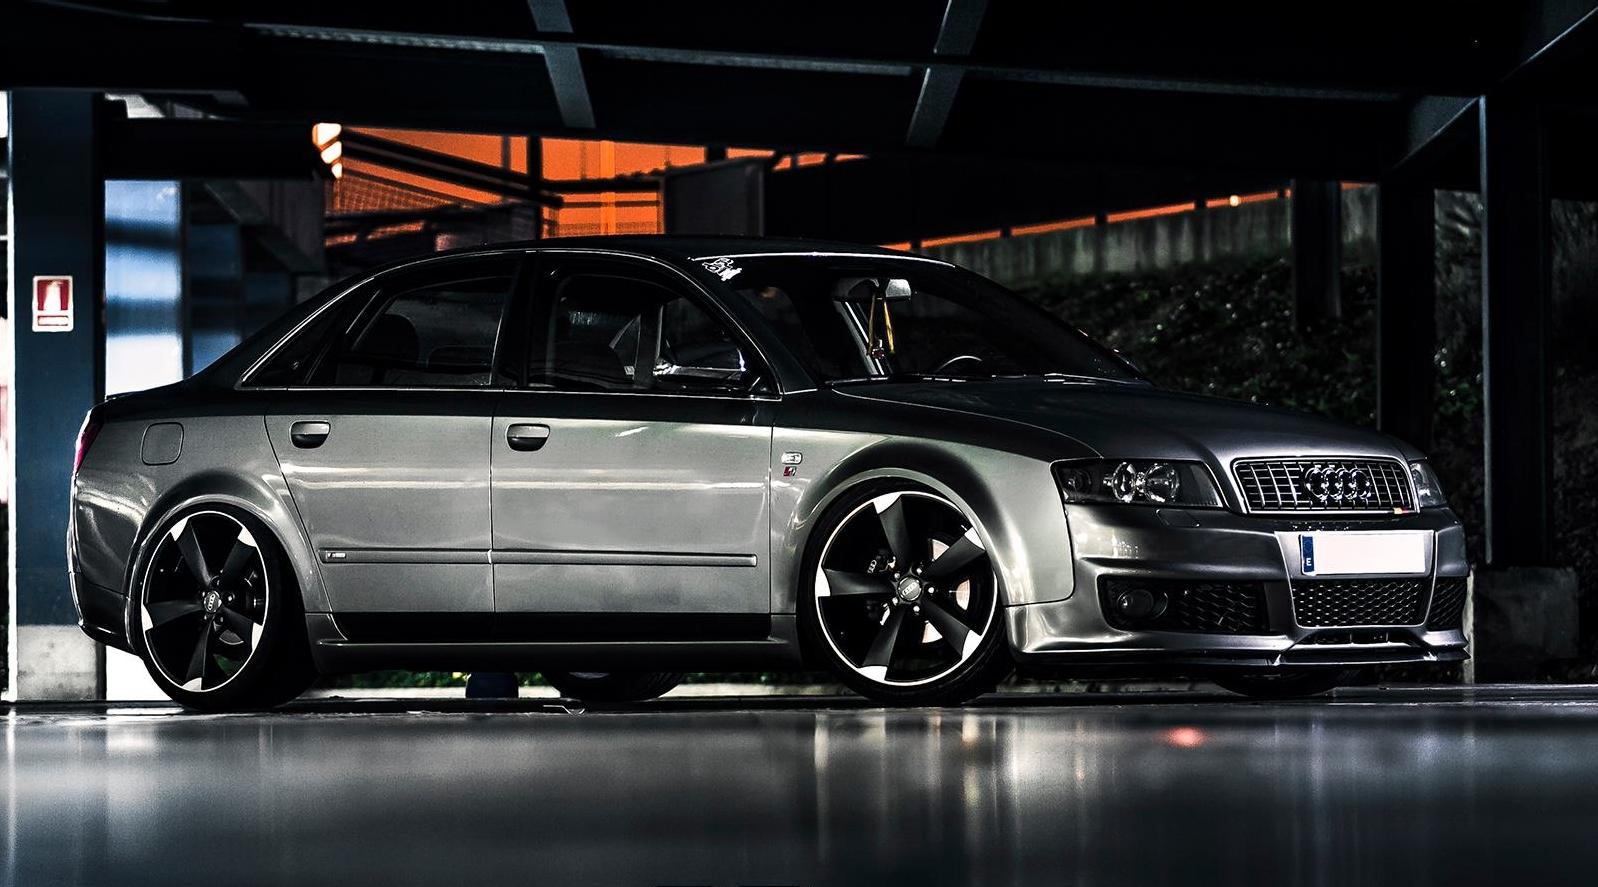 Audi A4 de Fernando